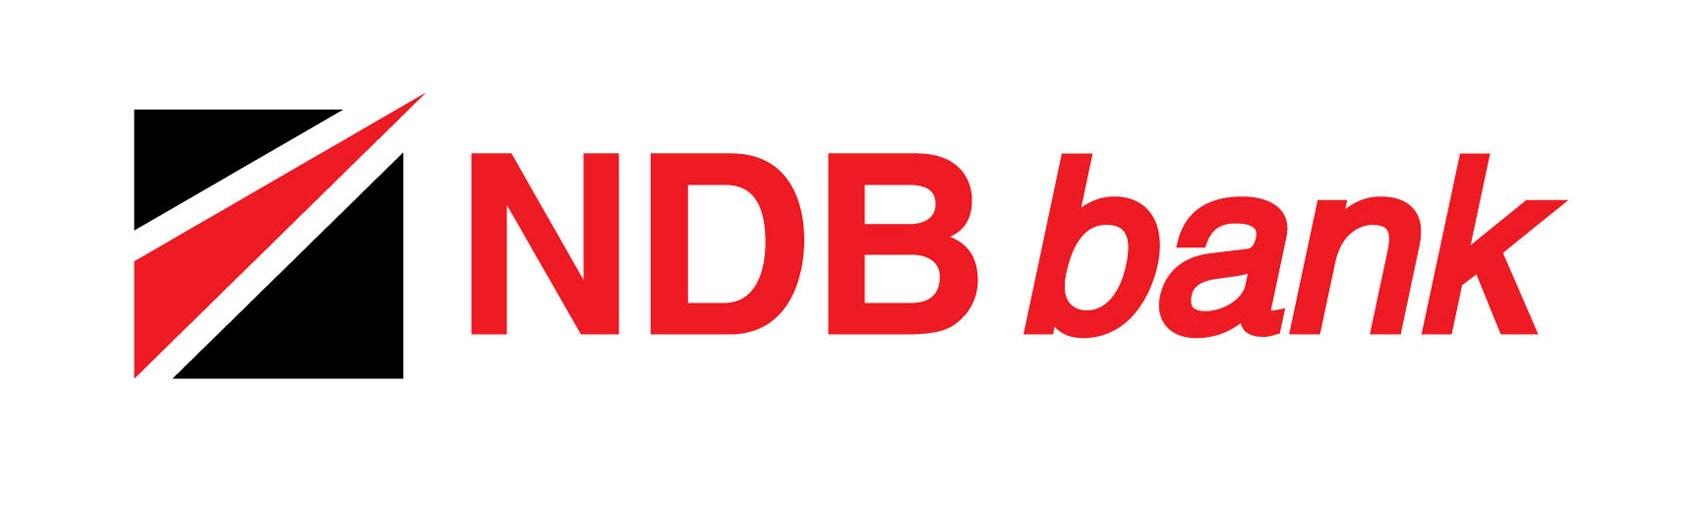 ndb bank logo - INVEST.LK